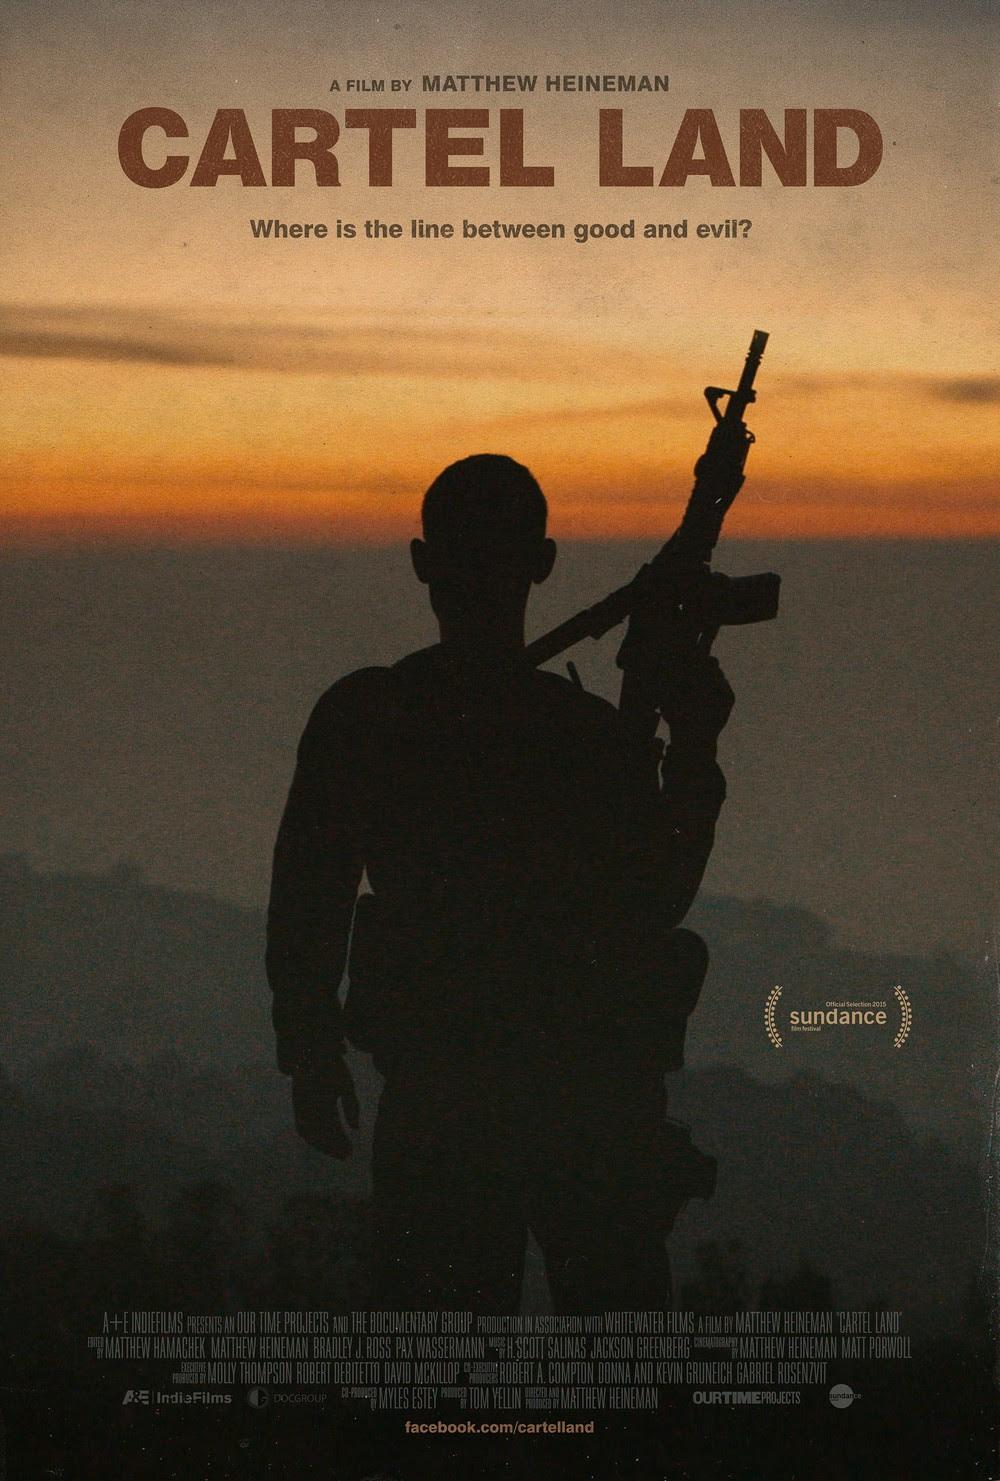 Cartel Land DVD Release Date  Redbox, Netflix, iTunes, Amazon